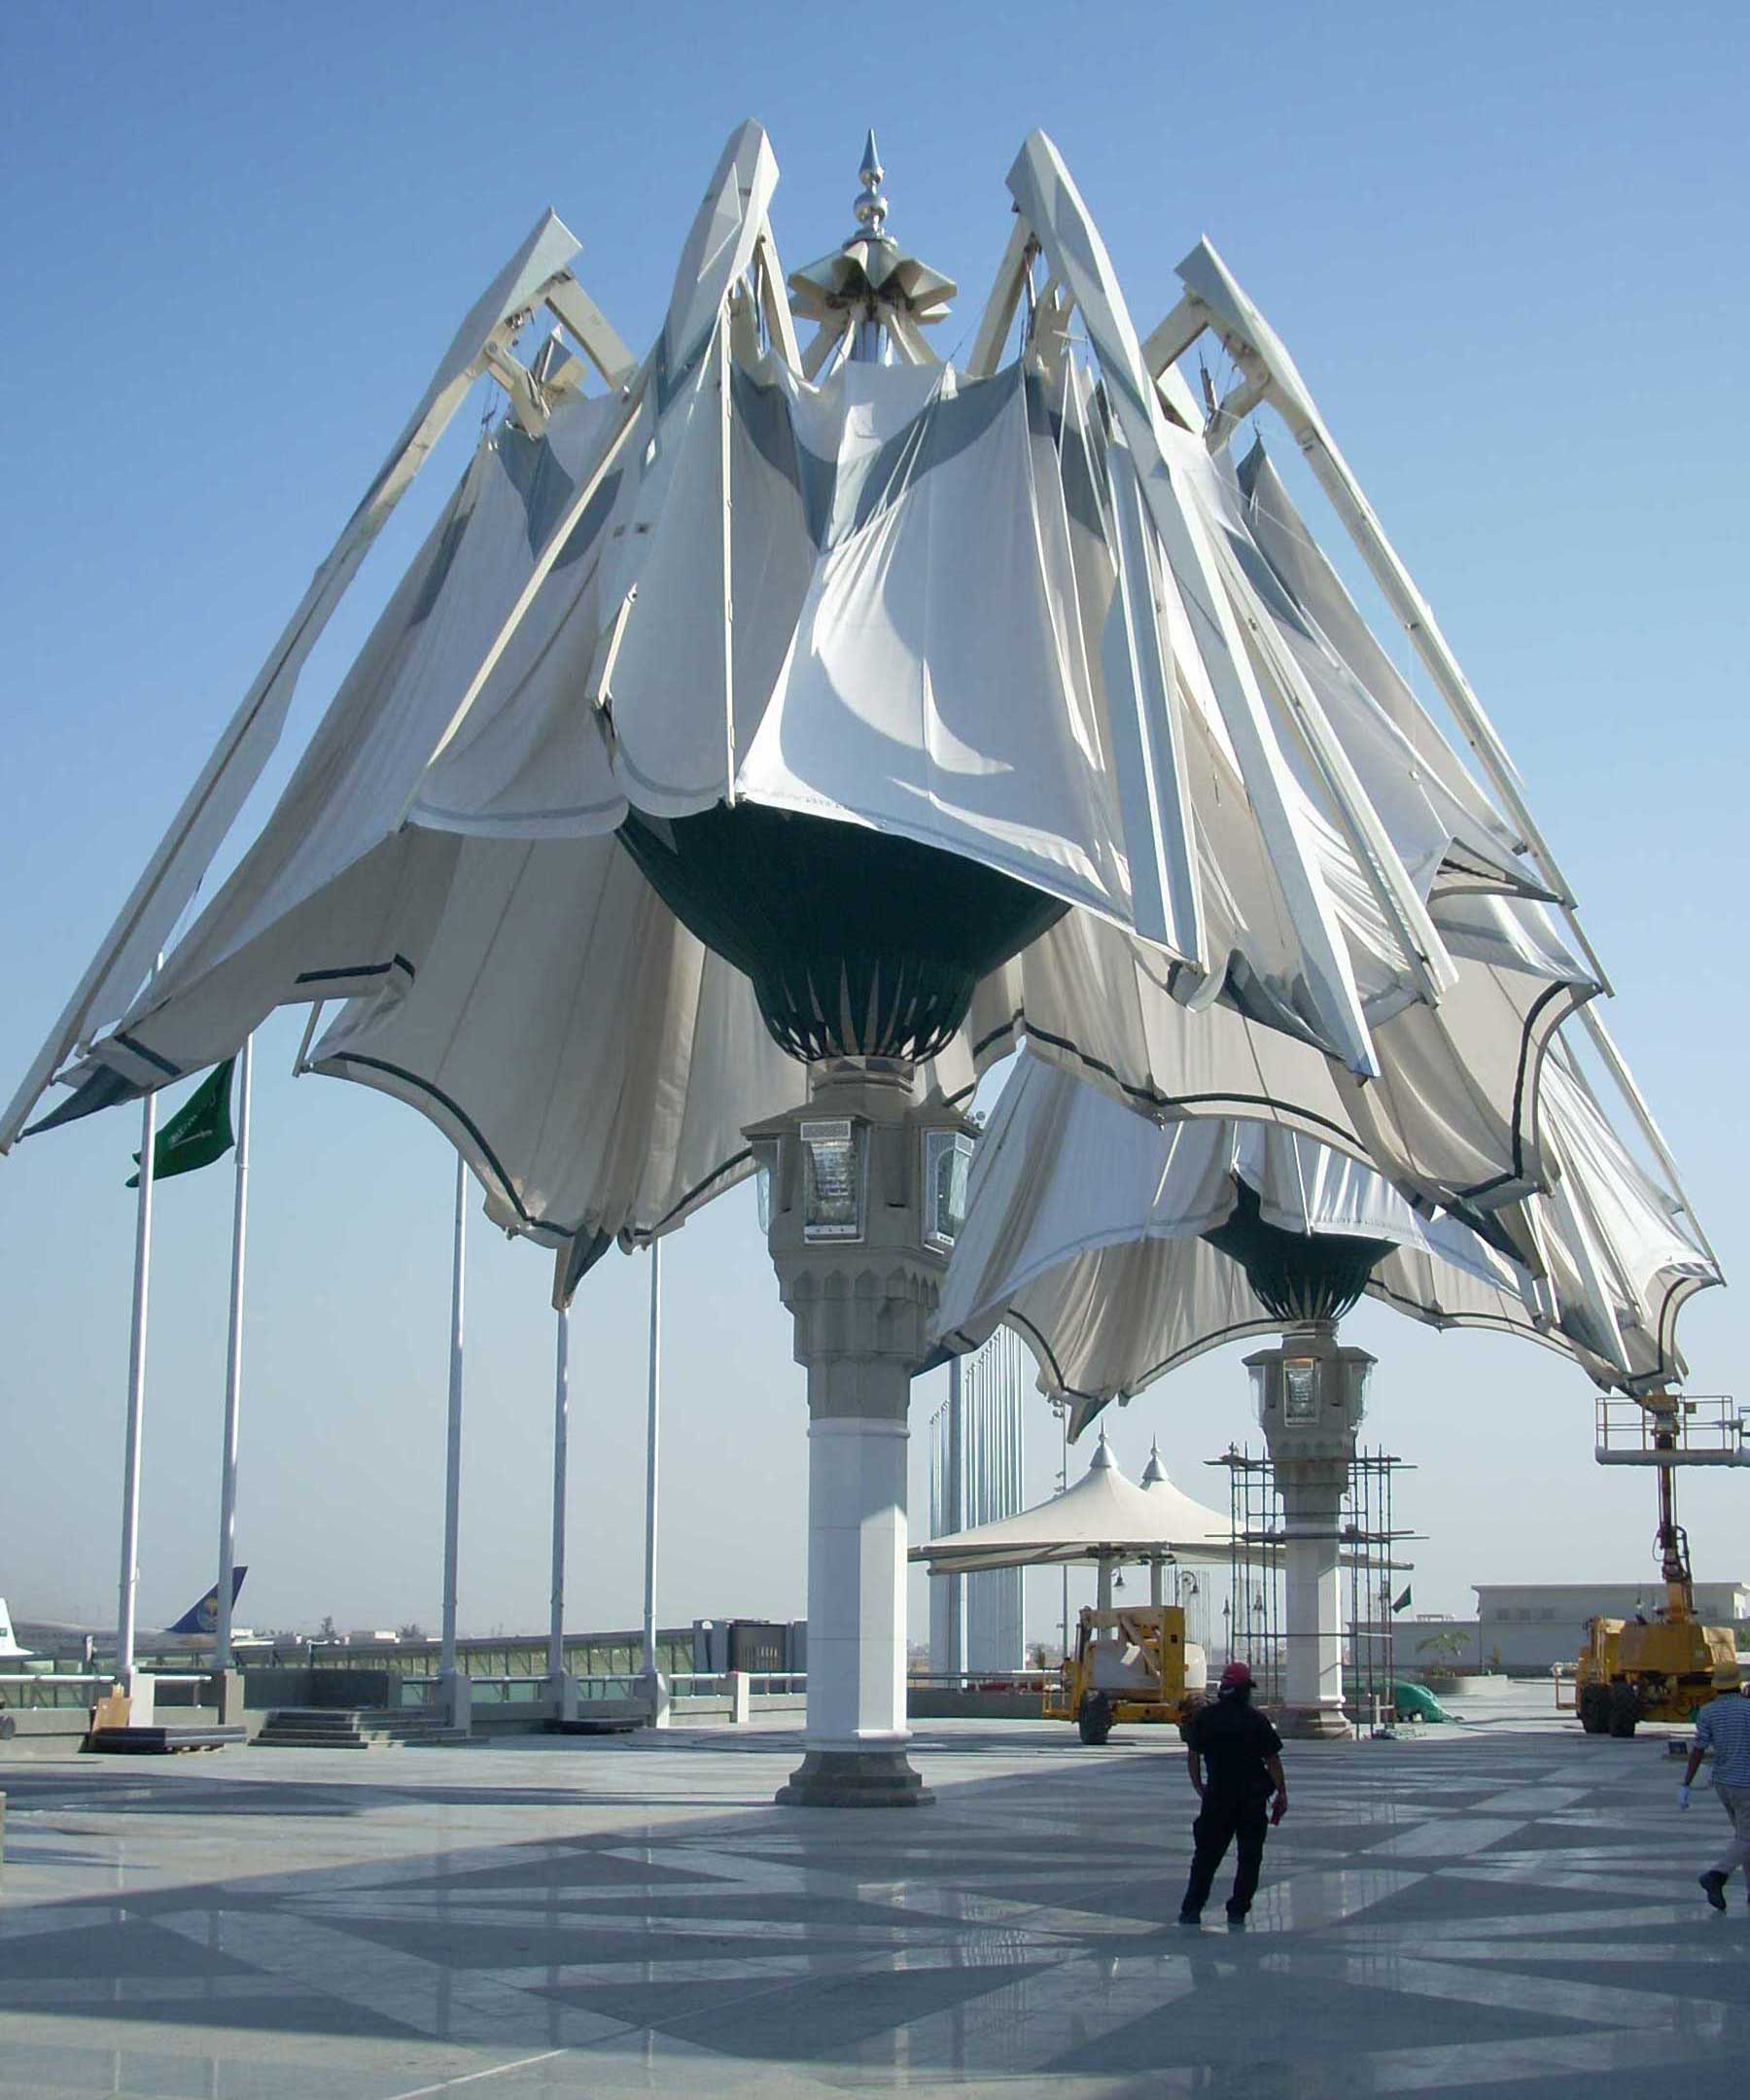 Royal terminal umbrellas jeddah saudi arabia sl rasch for Architecture upbrella